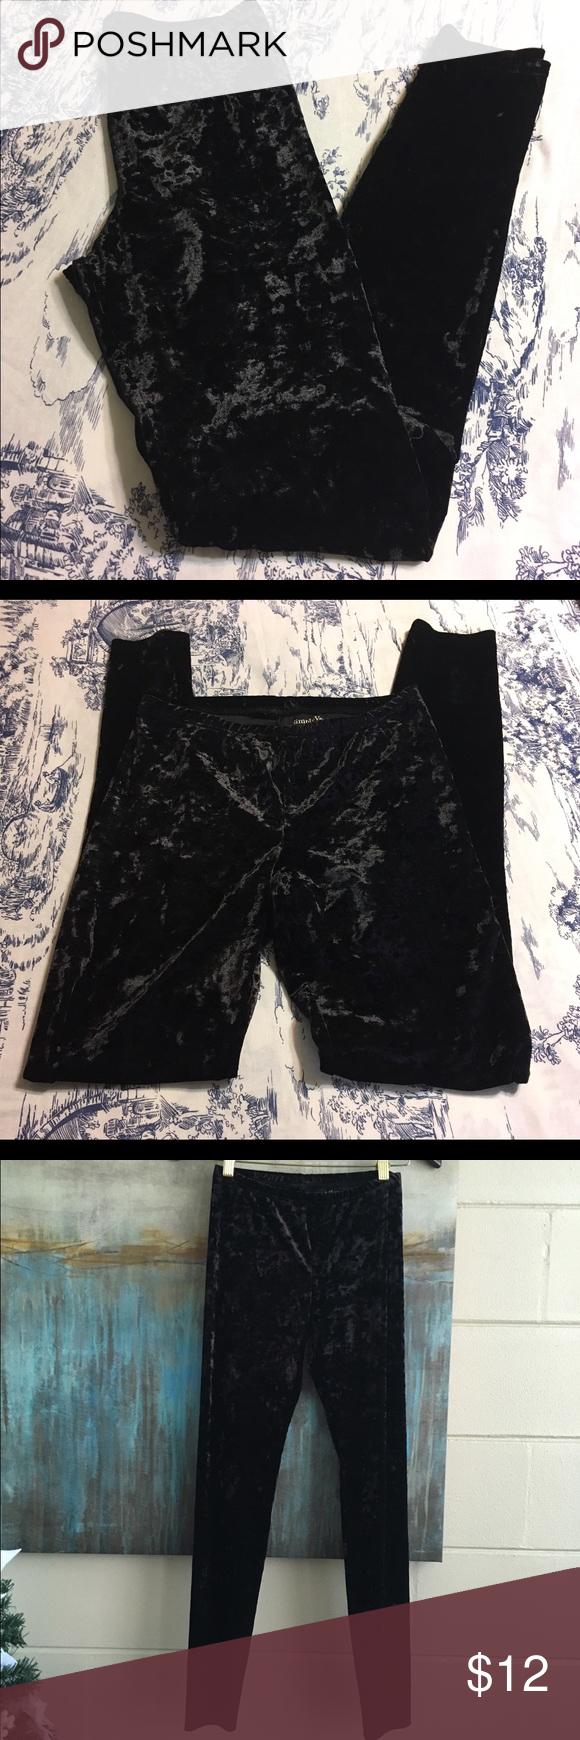 Vera Wang Velvet Leggings Size Small Super cute Simply Vera Vera Wang velvet leggings with elastic banded waist. Size Small. Color Black. Material Poly/Spandex. Measurements waist: 11.5, inseam: 30, rise: 7. Vera Wang Pants Leggings